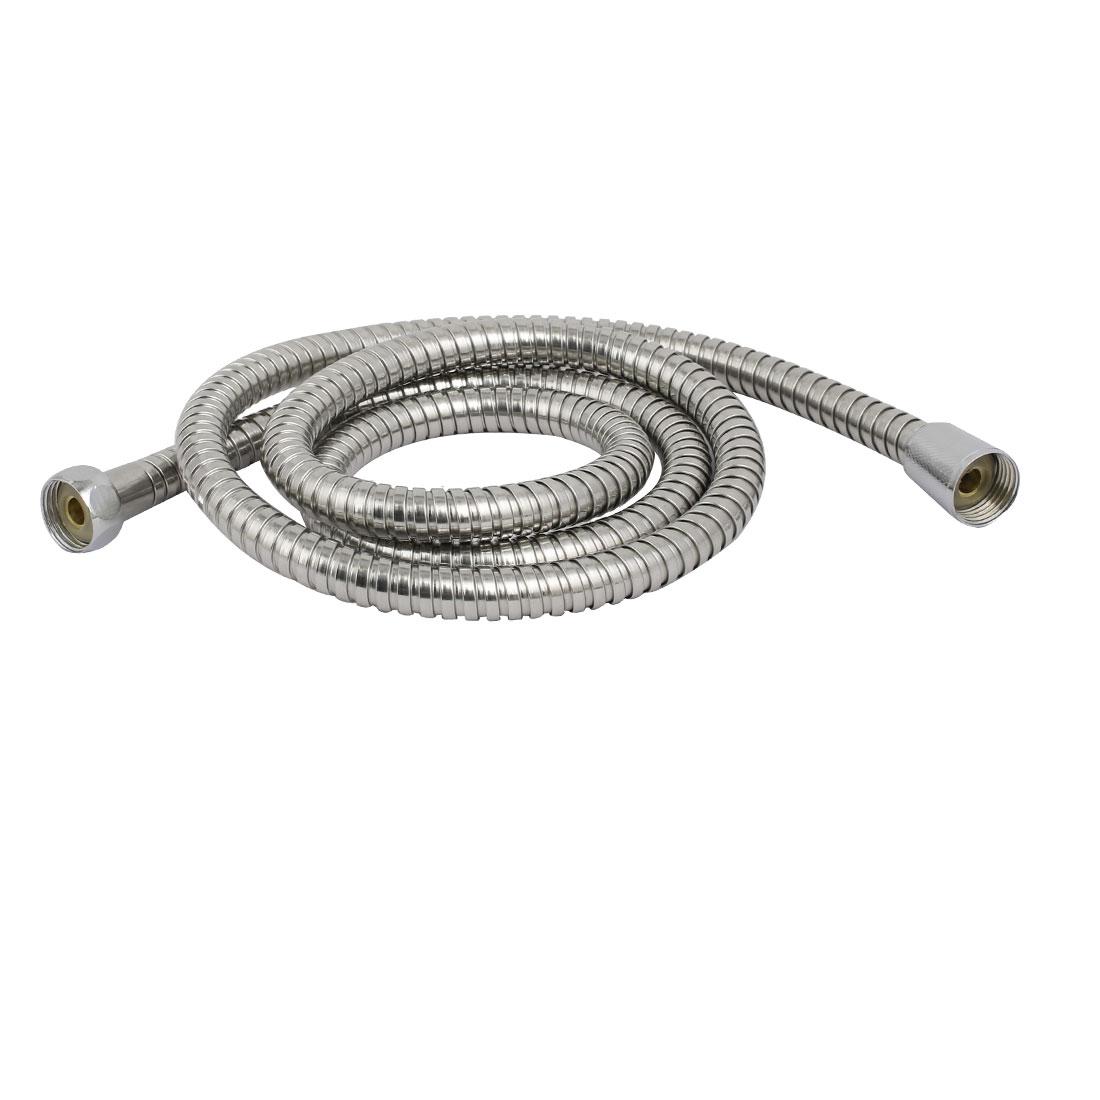 1.5M Length 304 Stainless Steel Flexible Handheld Shower Hose Plumbing Fitting